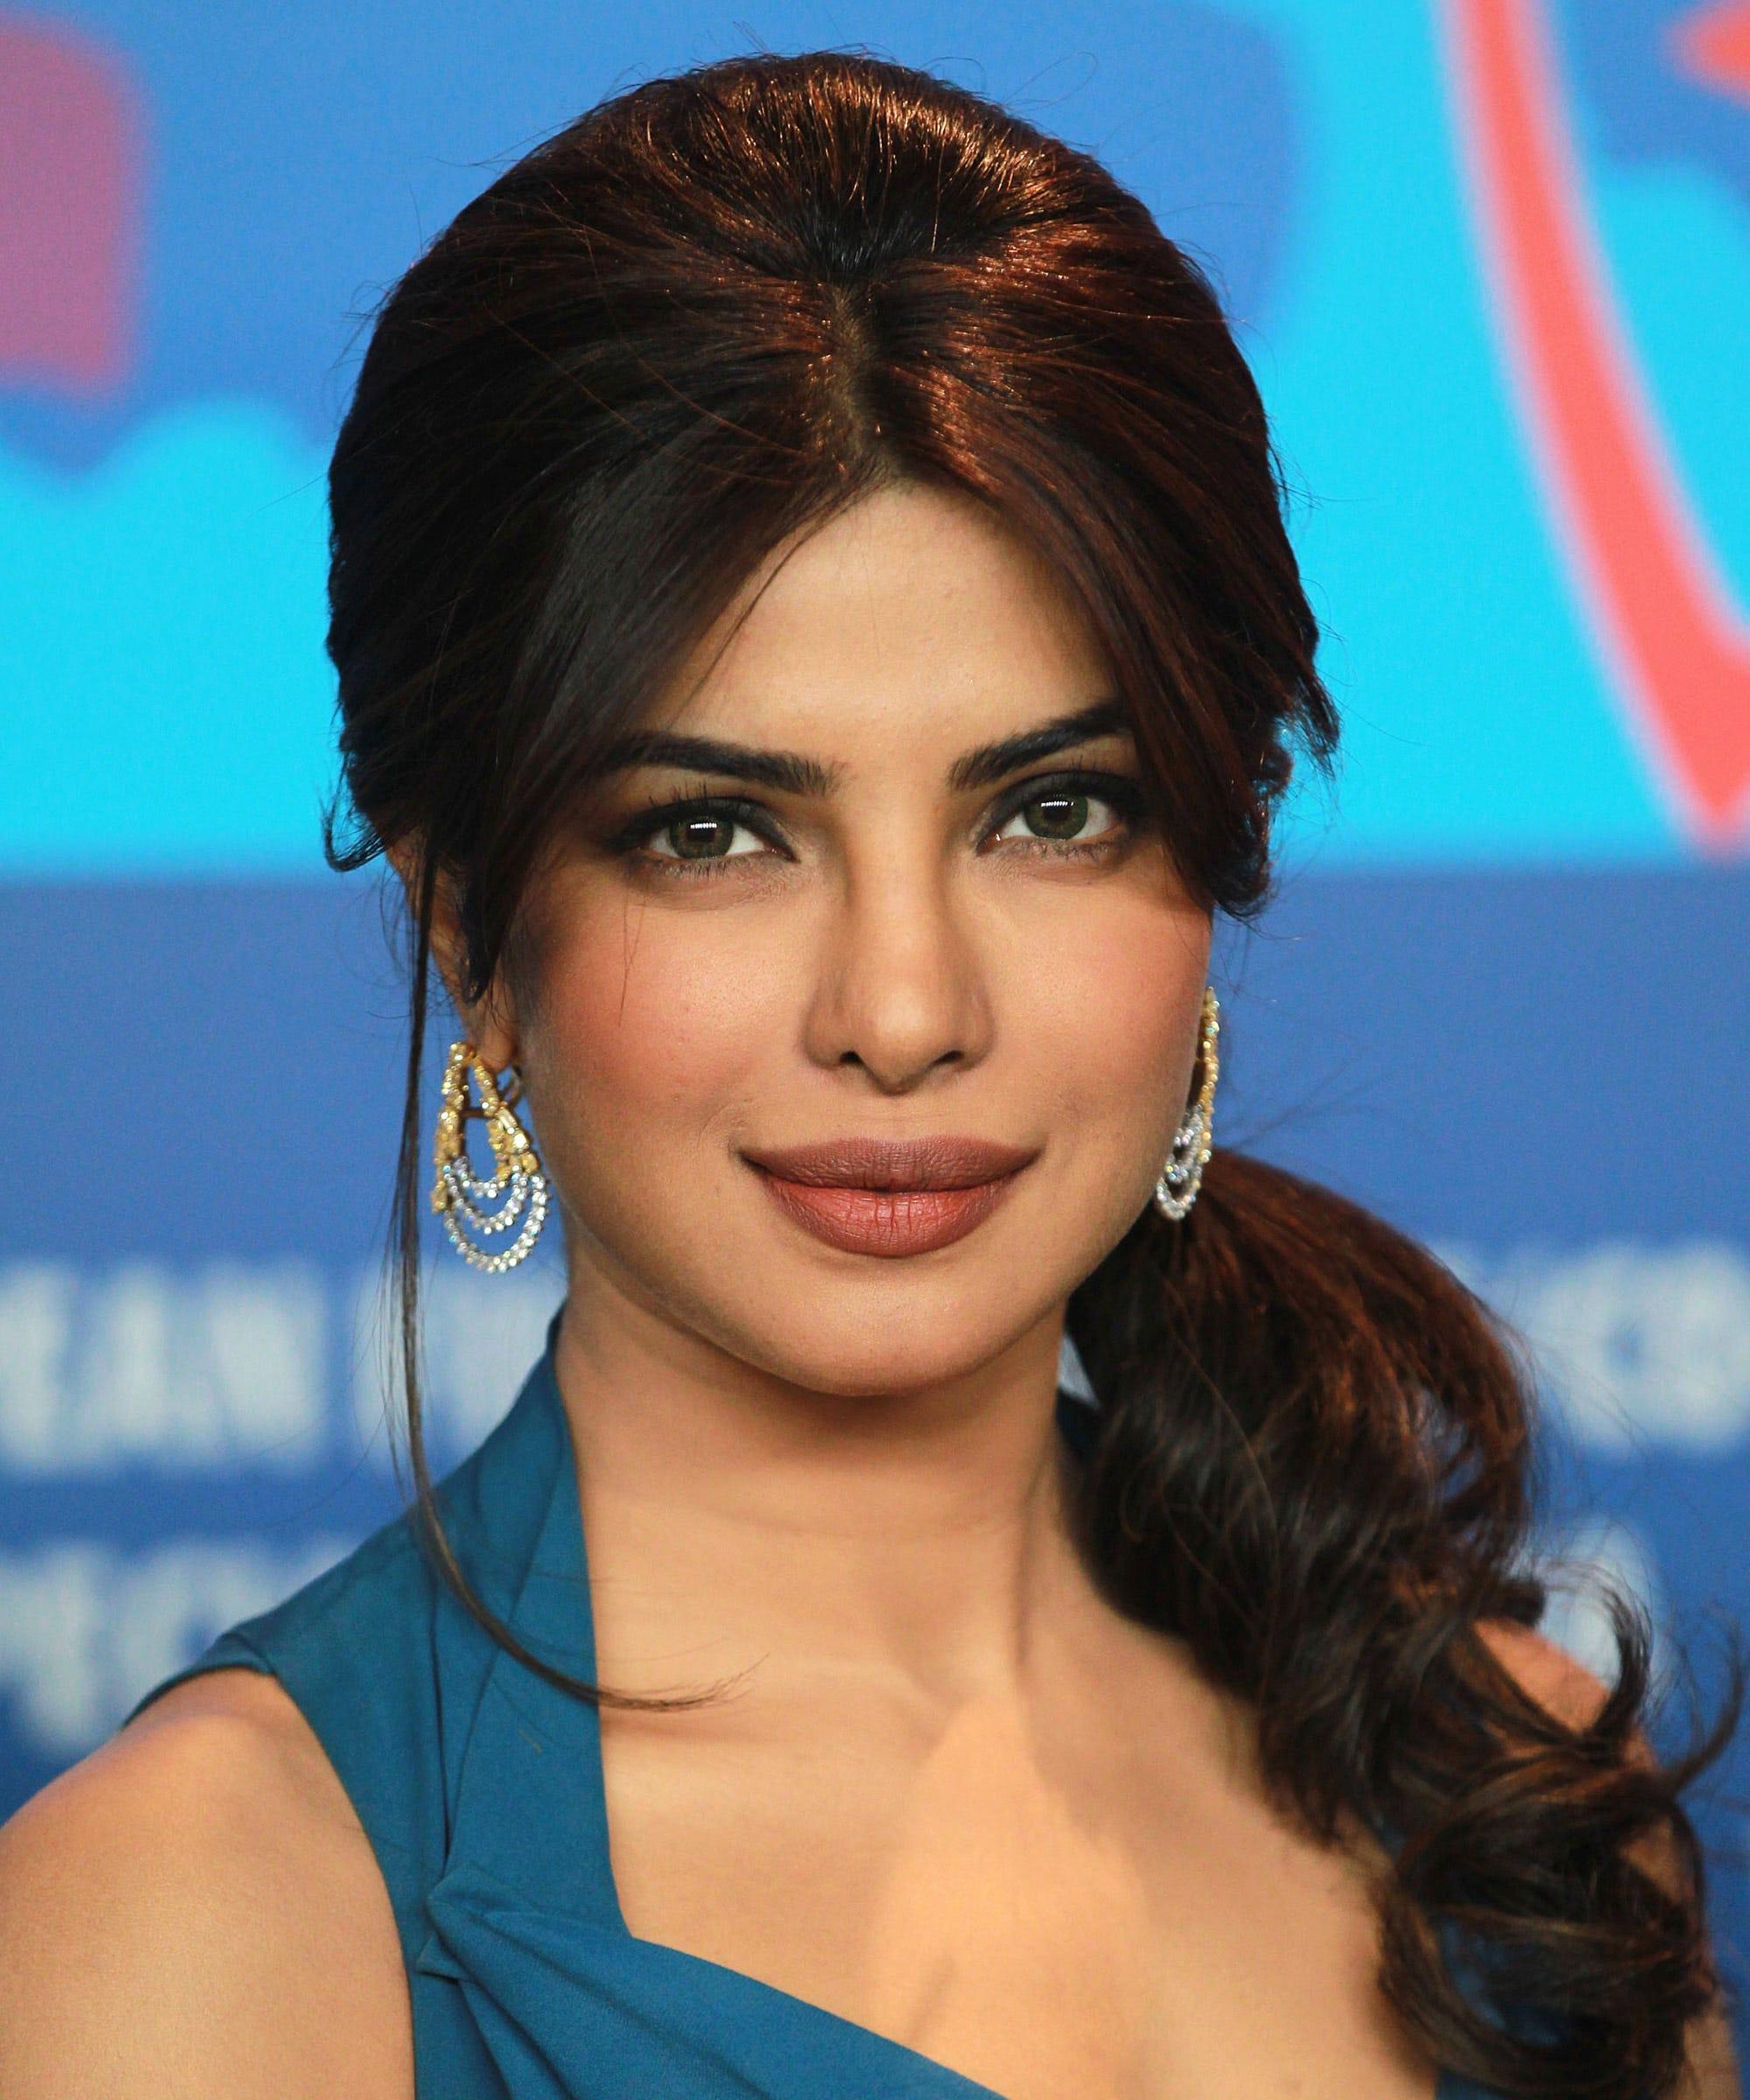 Priyanka Chopra Beauty Transformation Over The Years